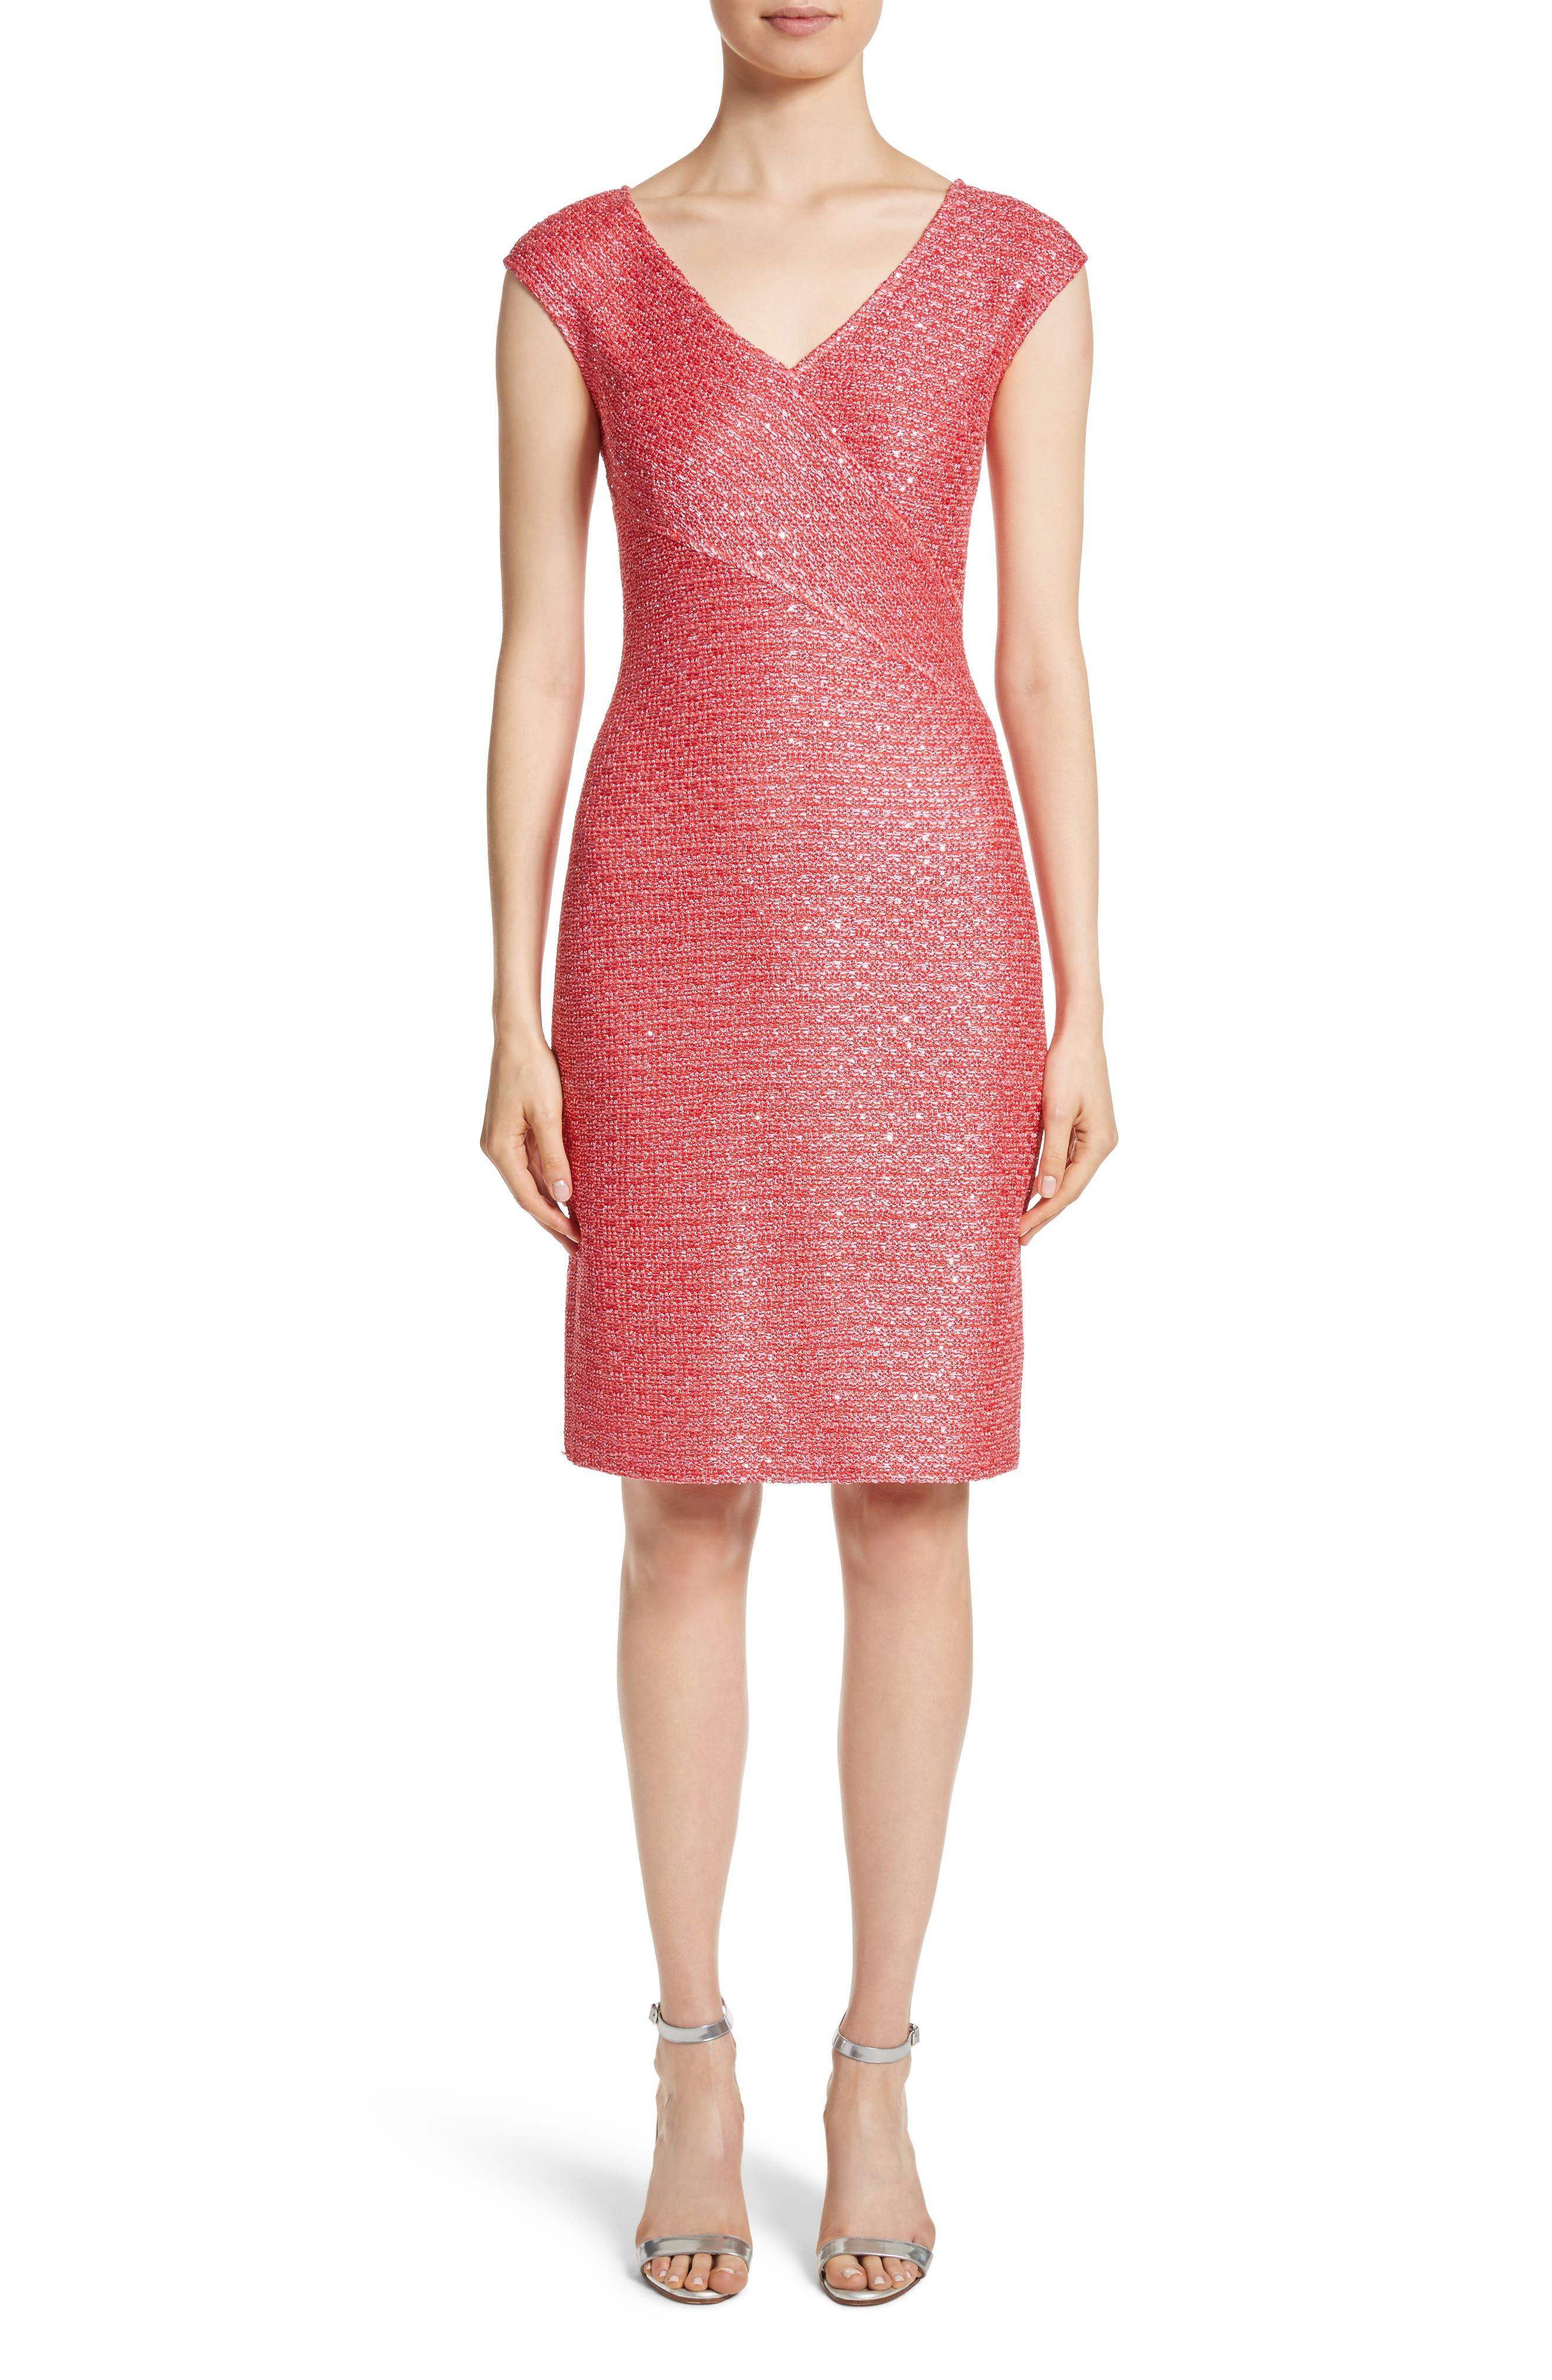 Main Image - St. John Collection Hansh Knit Dress